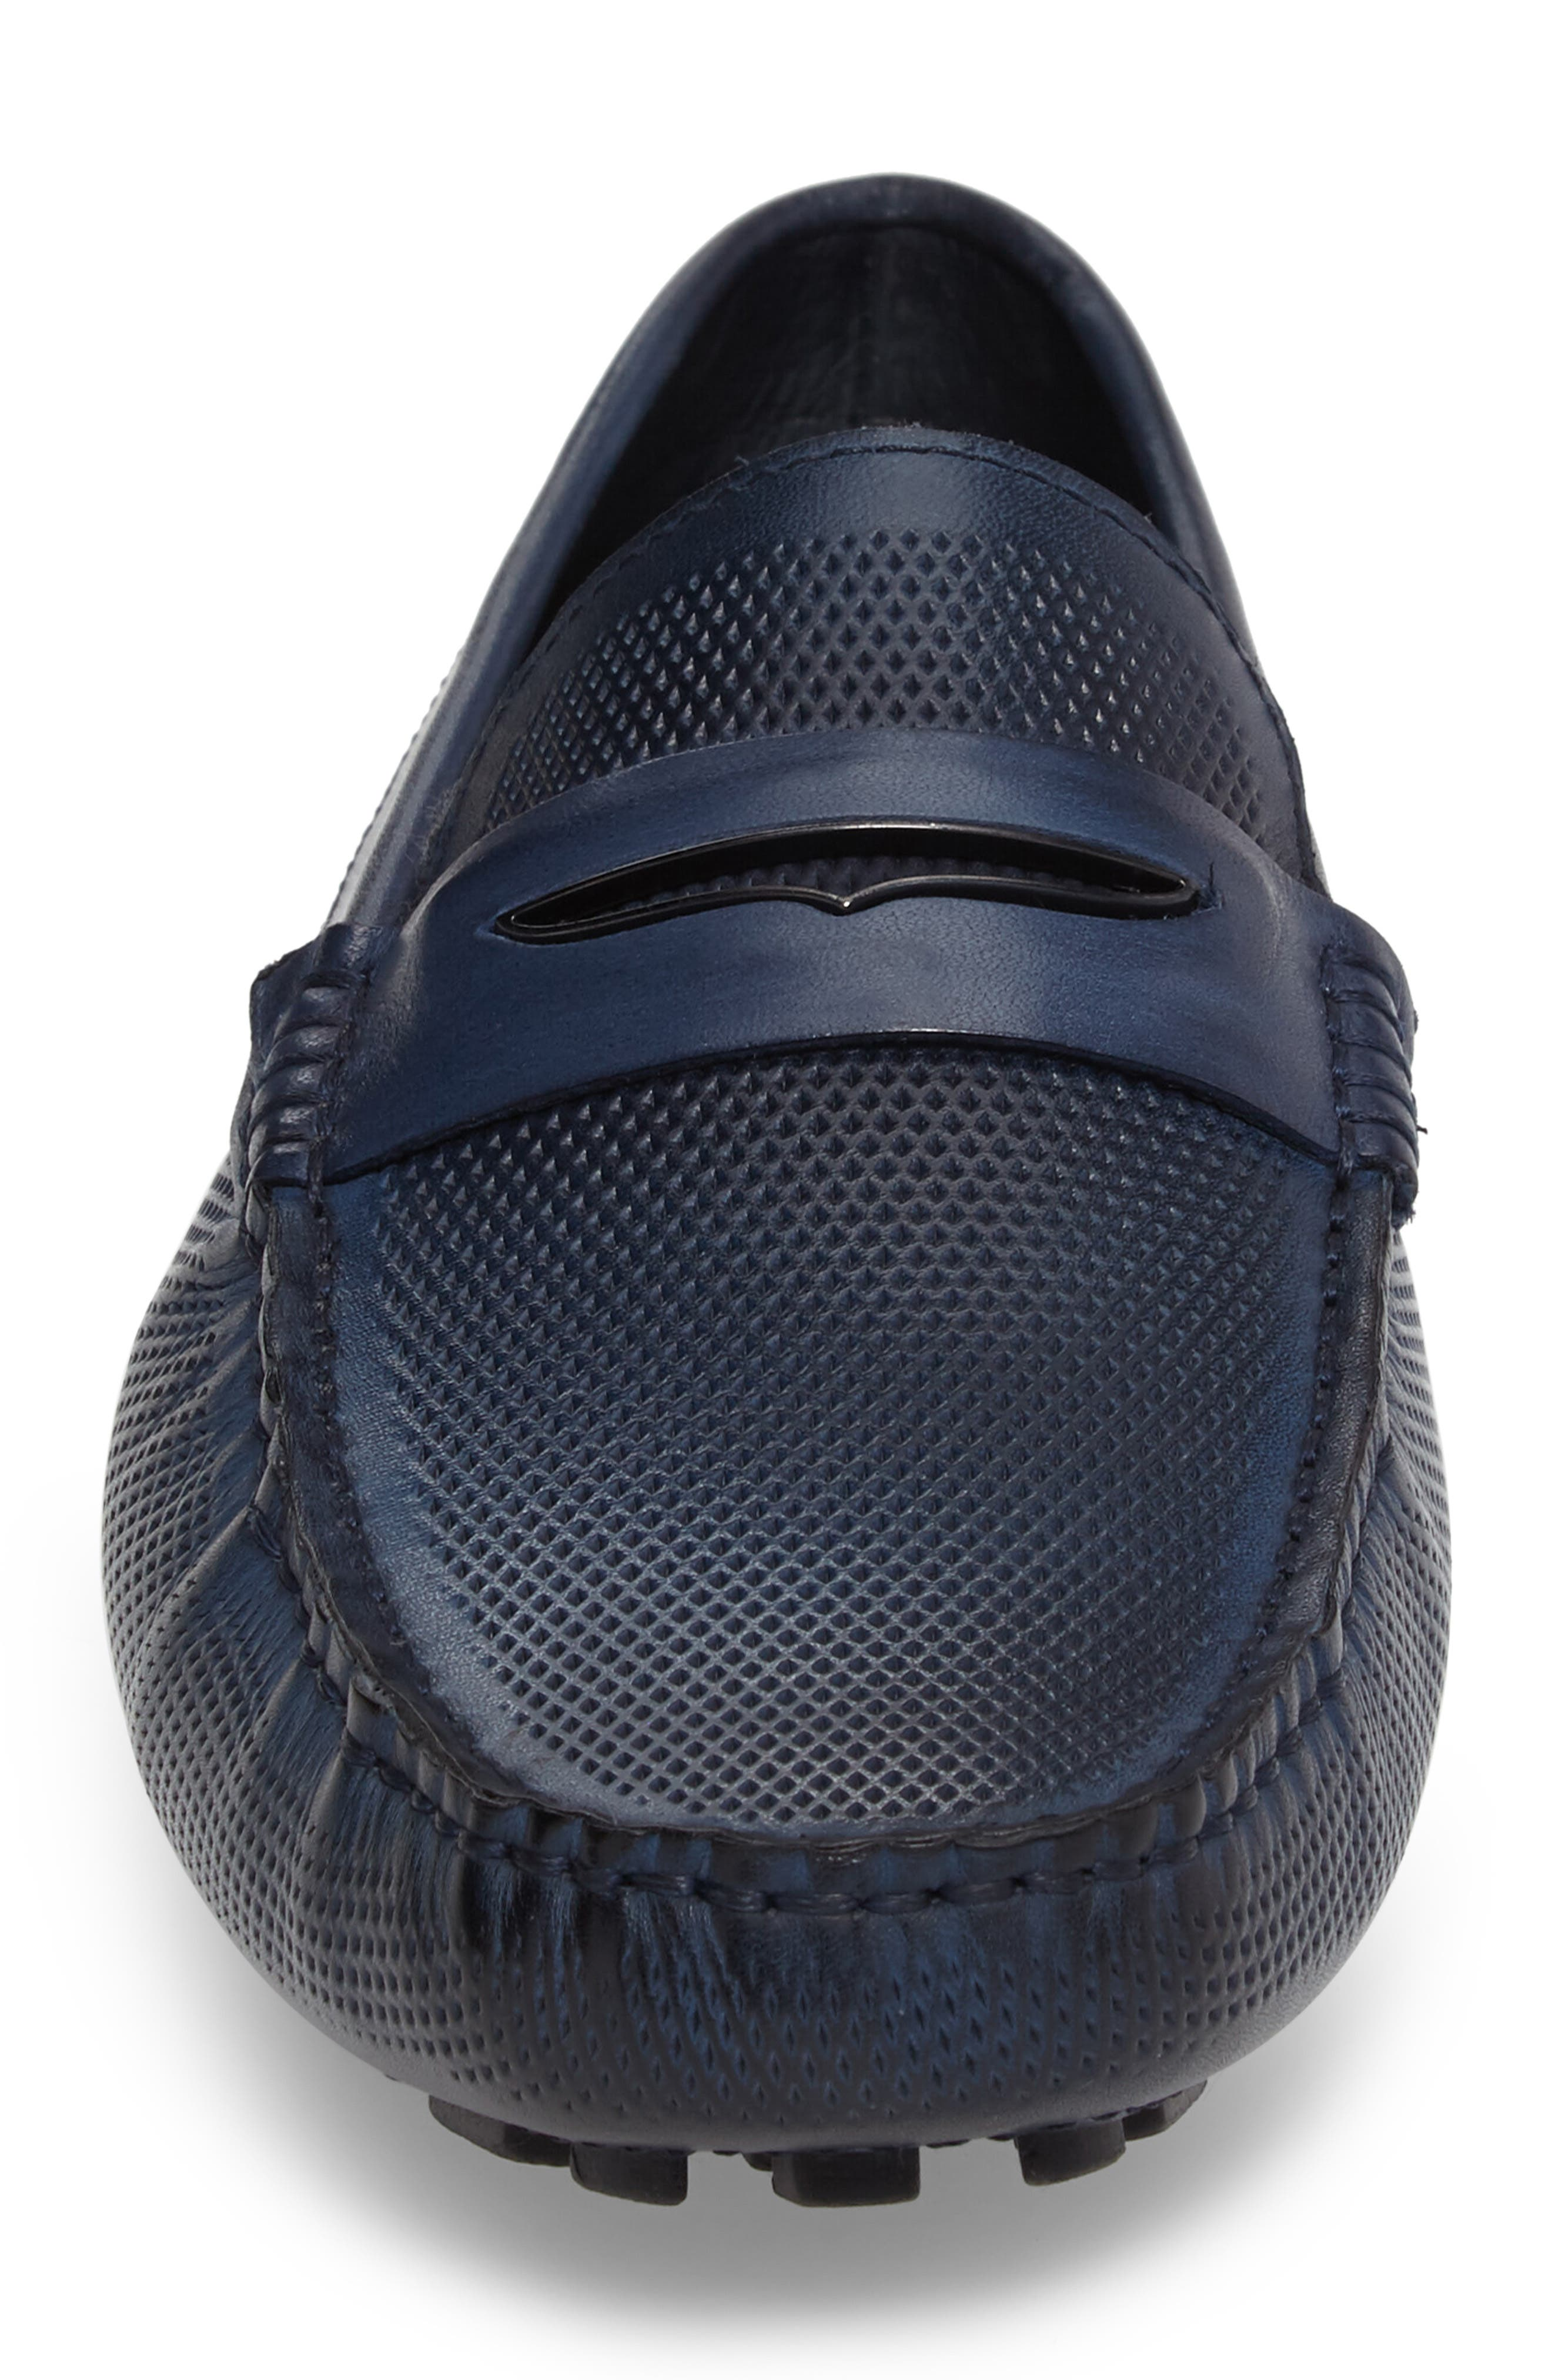 Alternate Image 4  - Zanzara Mondrian Driving Shoe (Men)